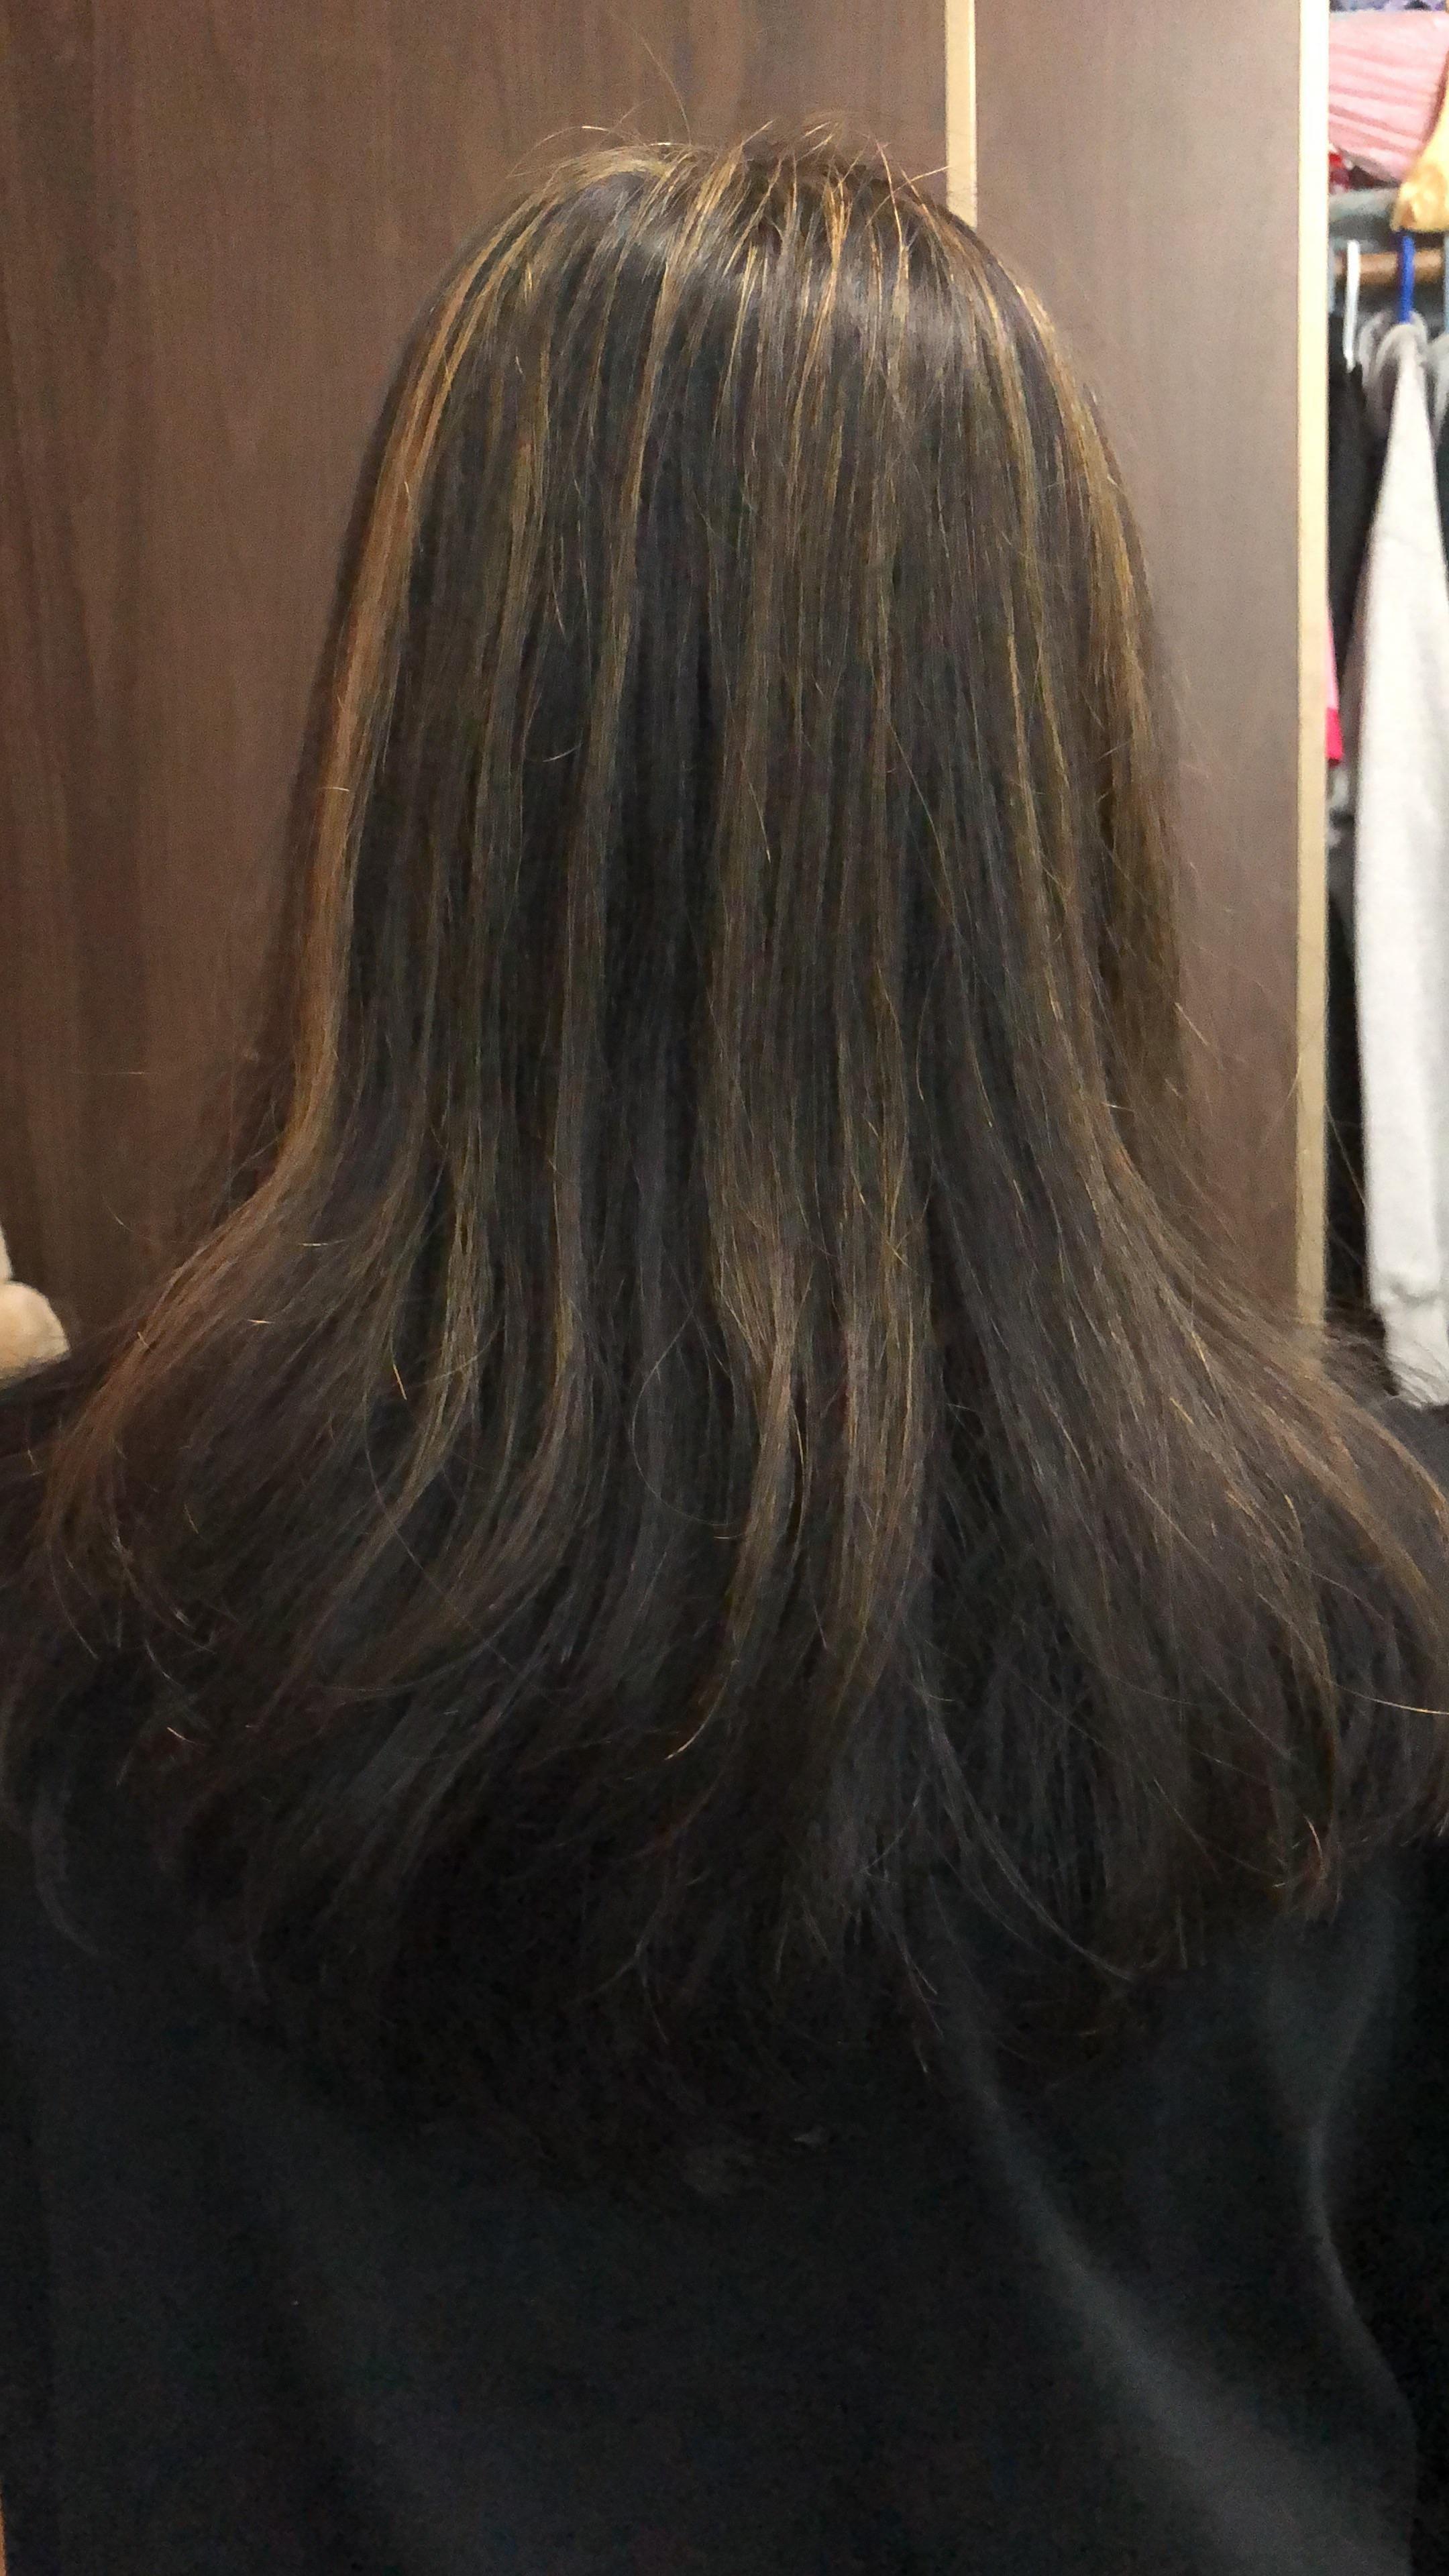 Tiger Stripe Highlights Please Help Asap Hair Beauty Skin